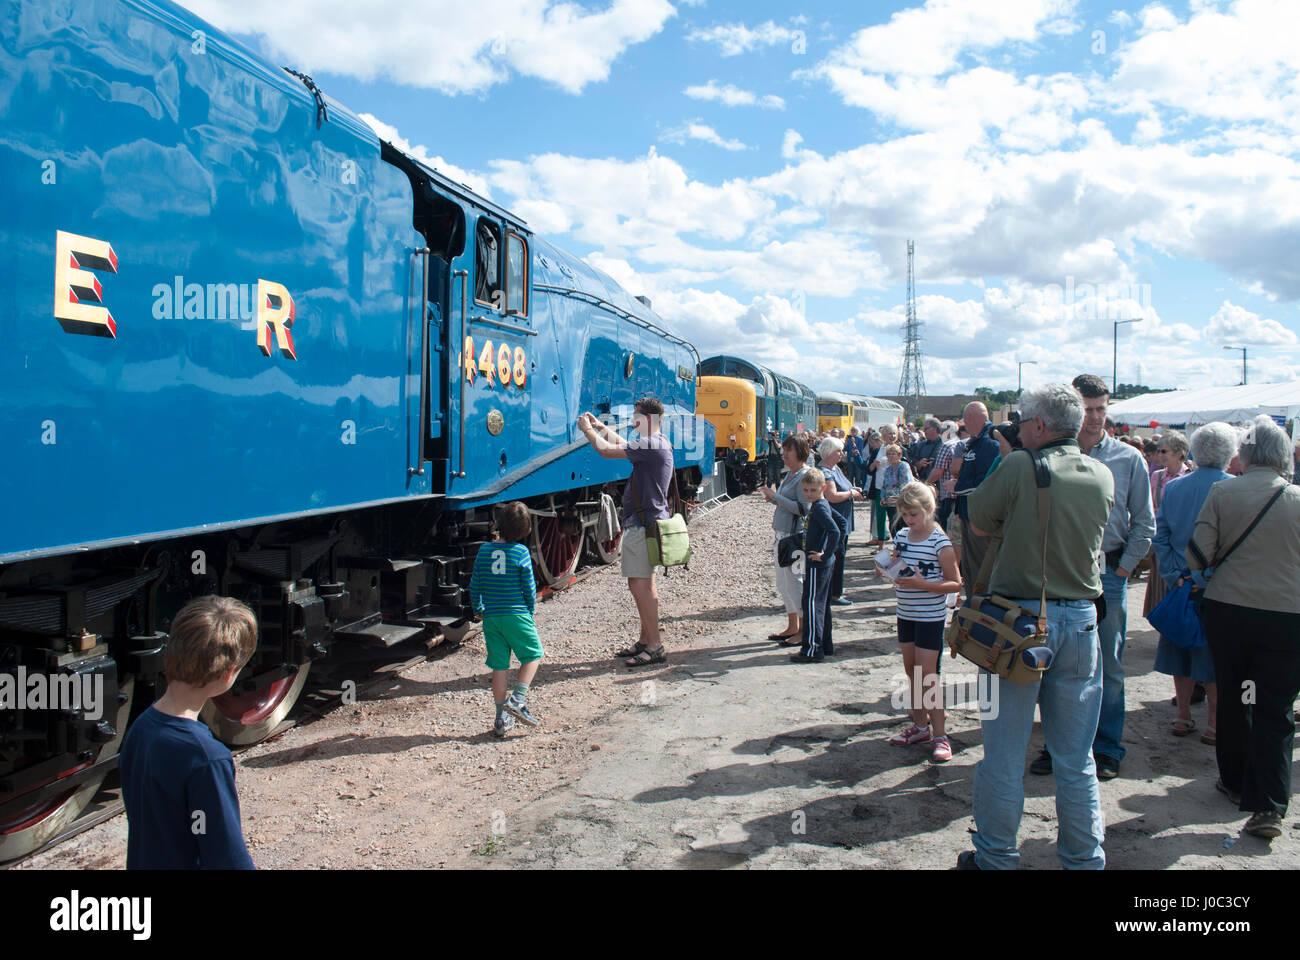 Man photographing side of Mallard steam train - Stock Image